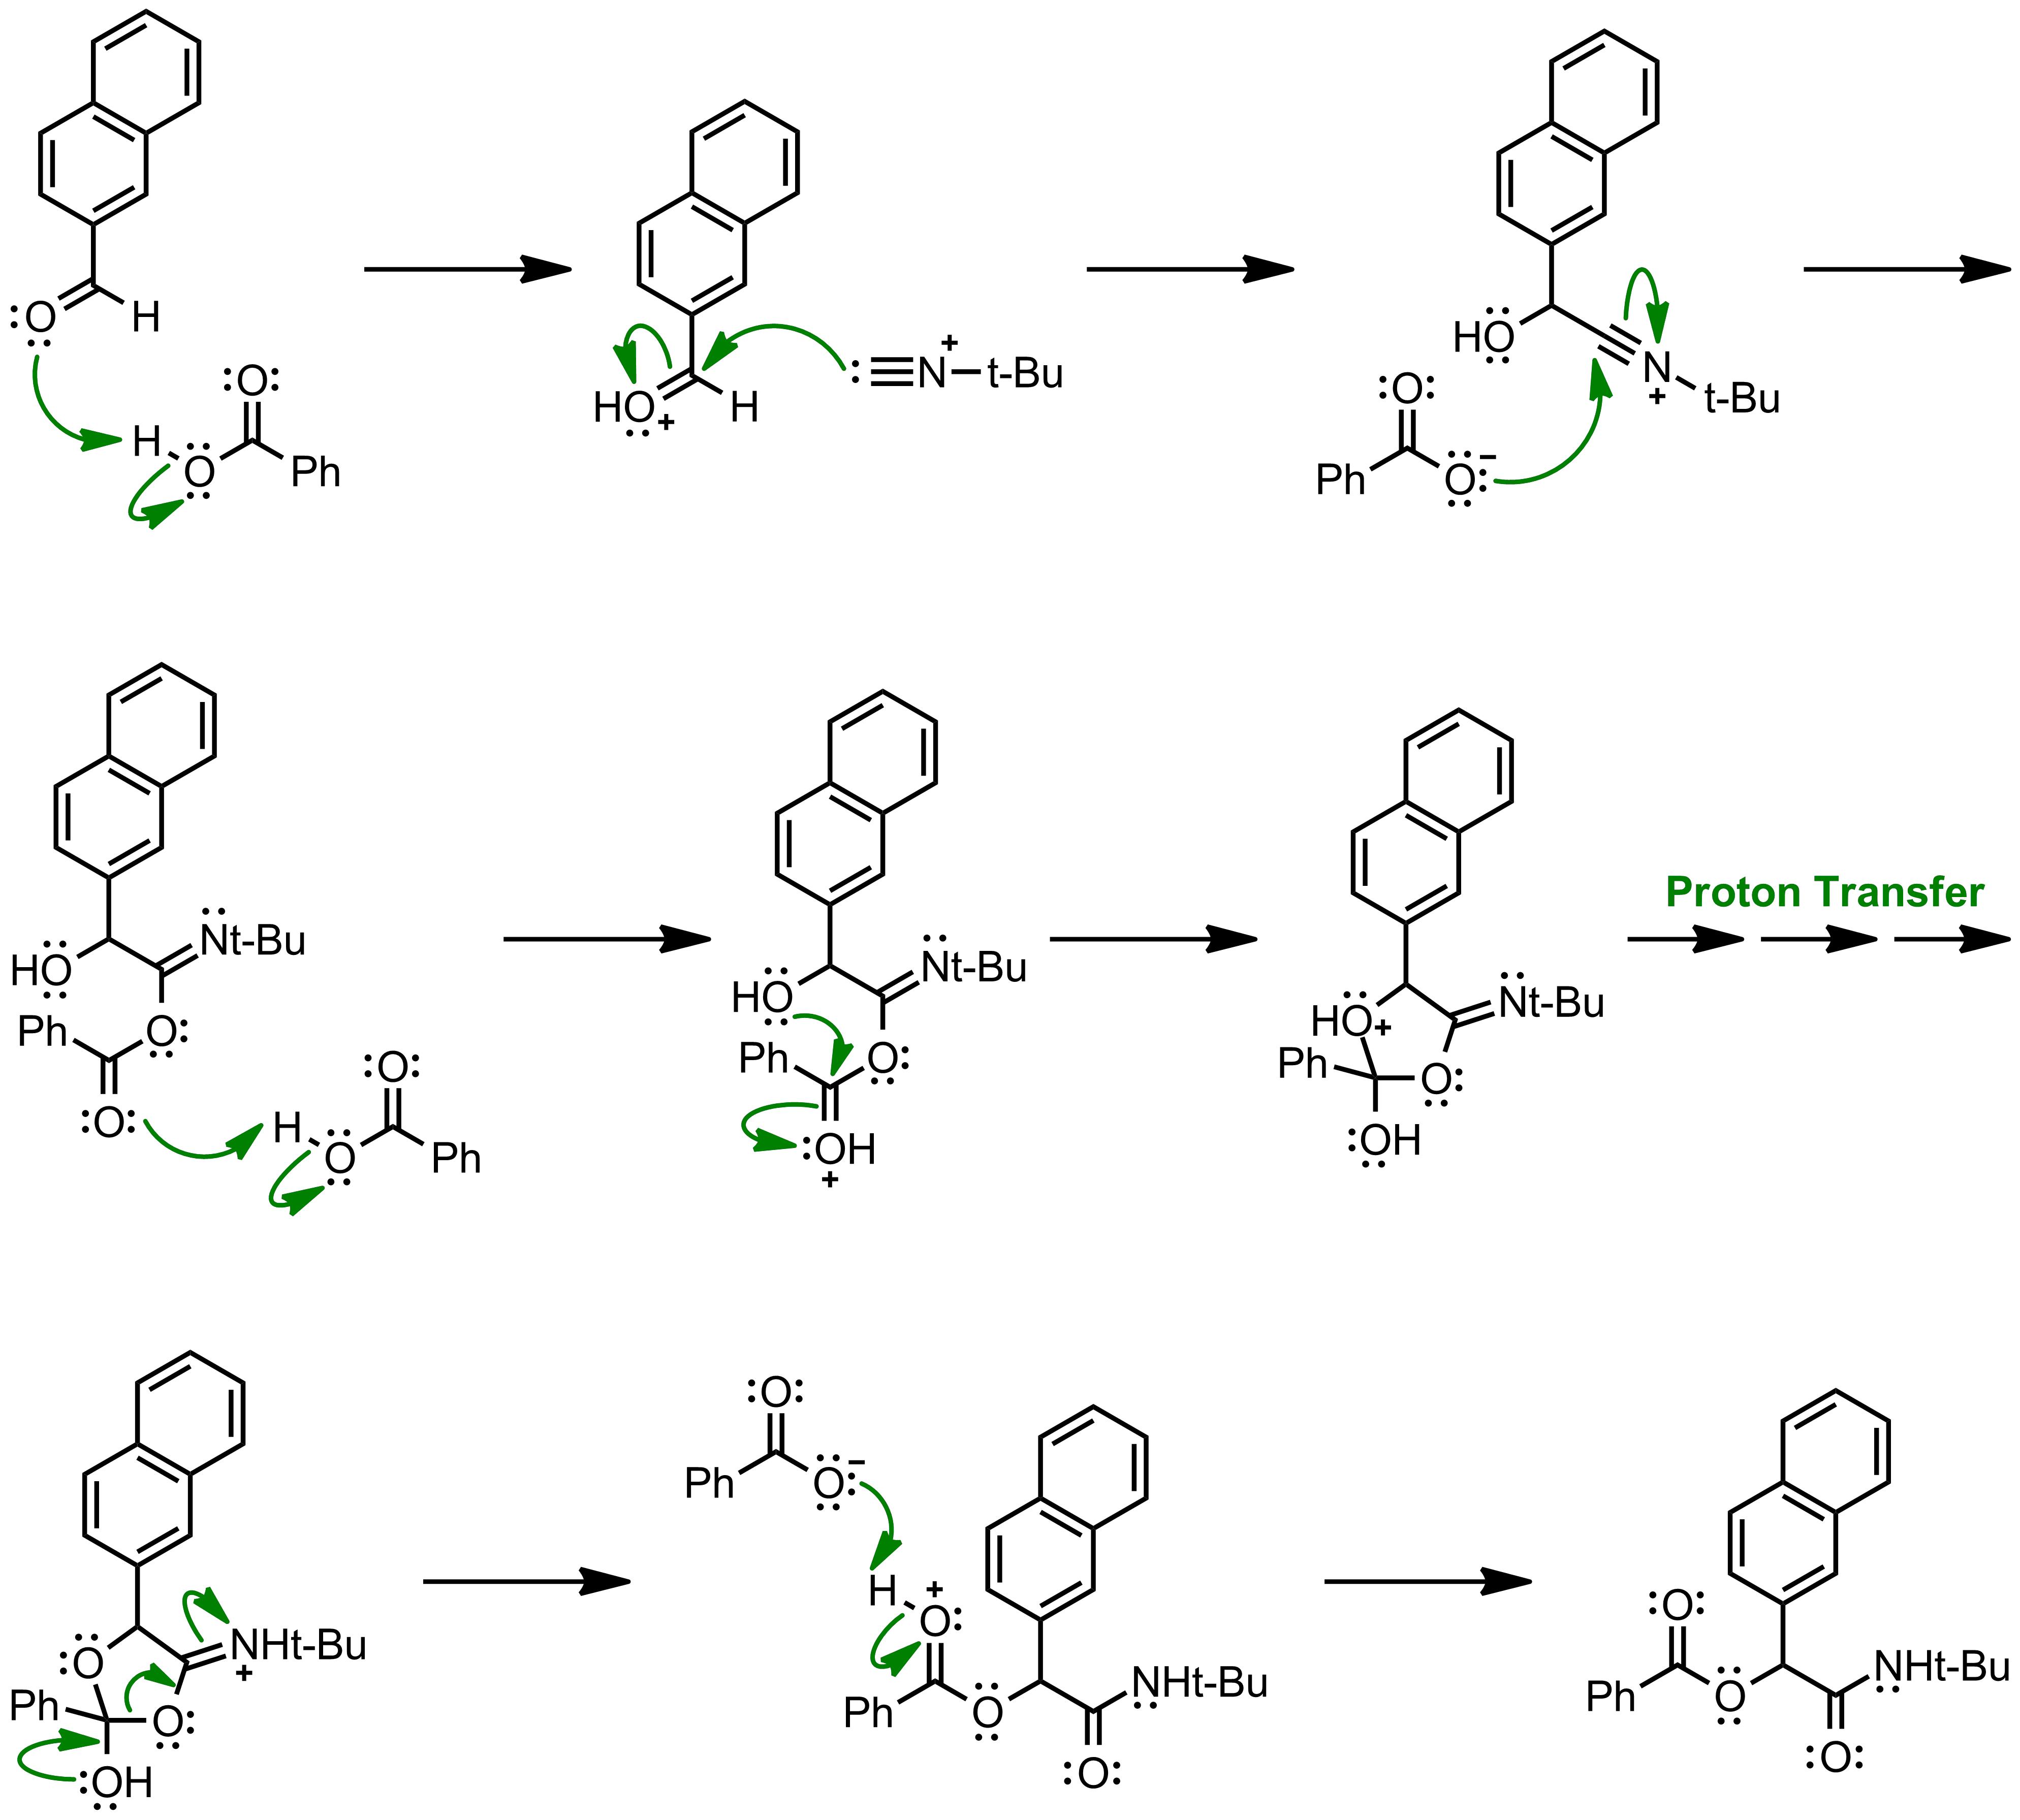 Mechanism of the Passerini Reaction